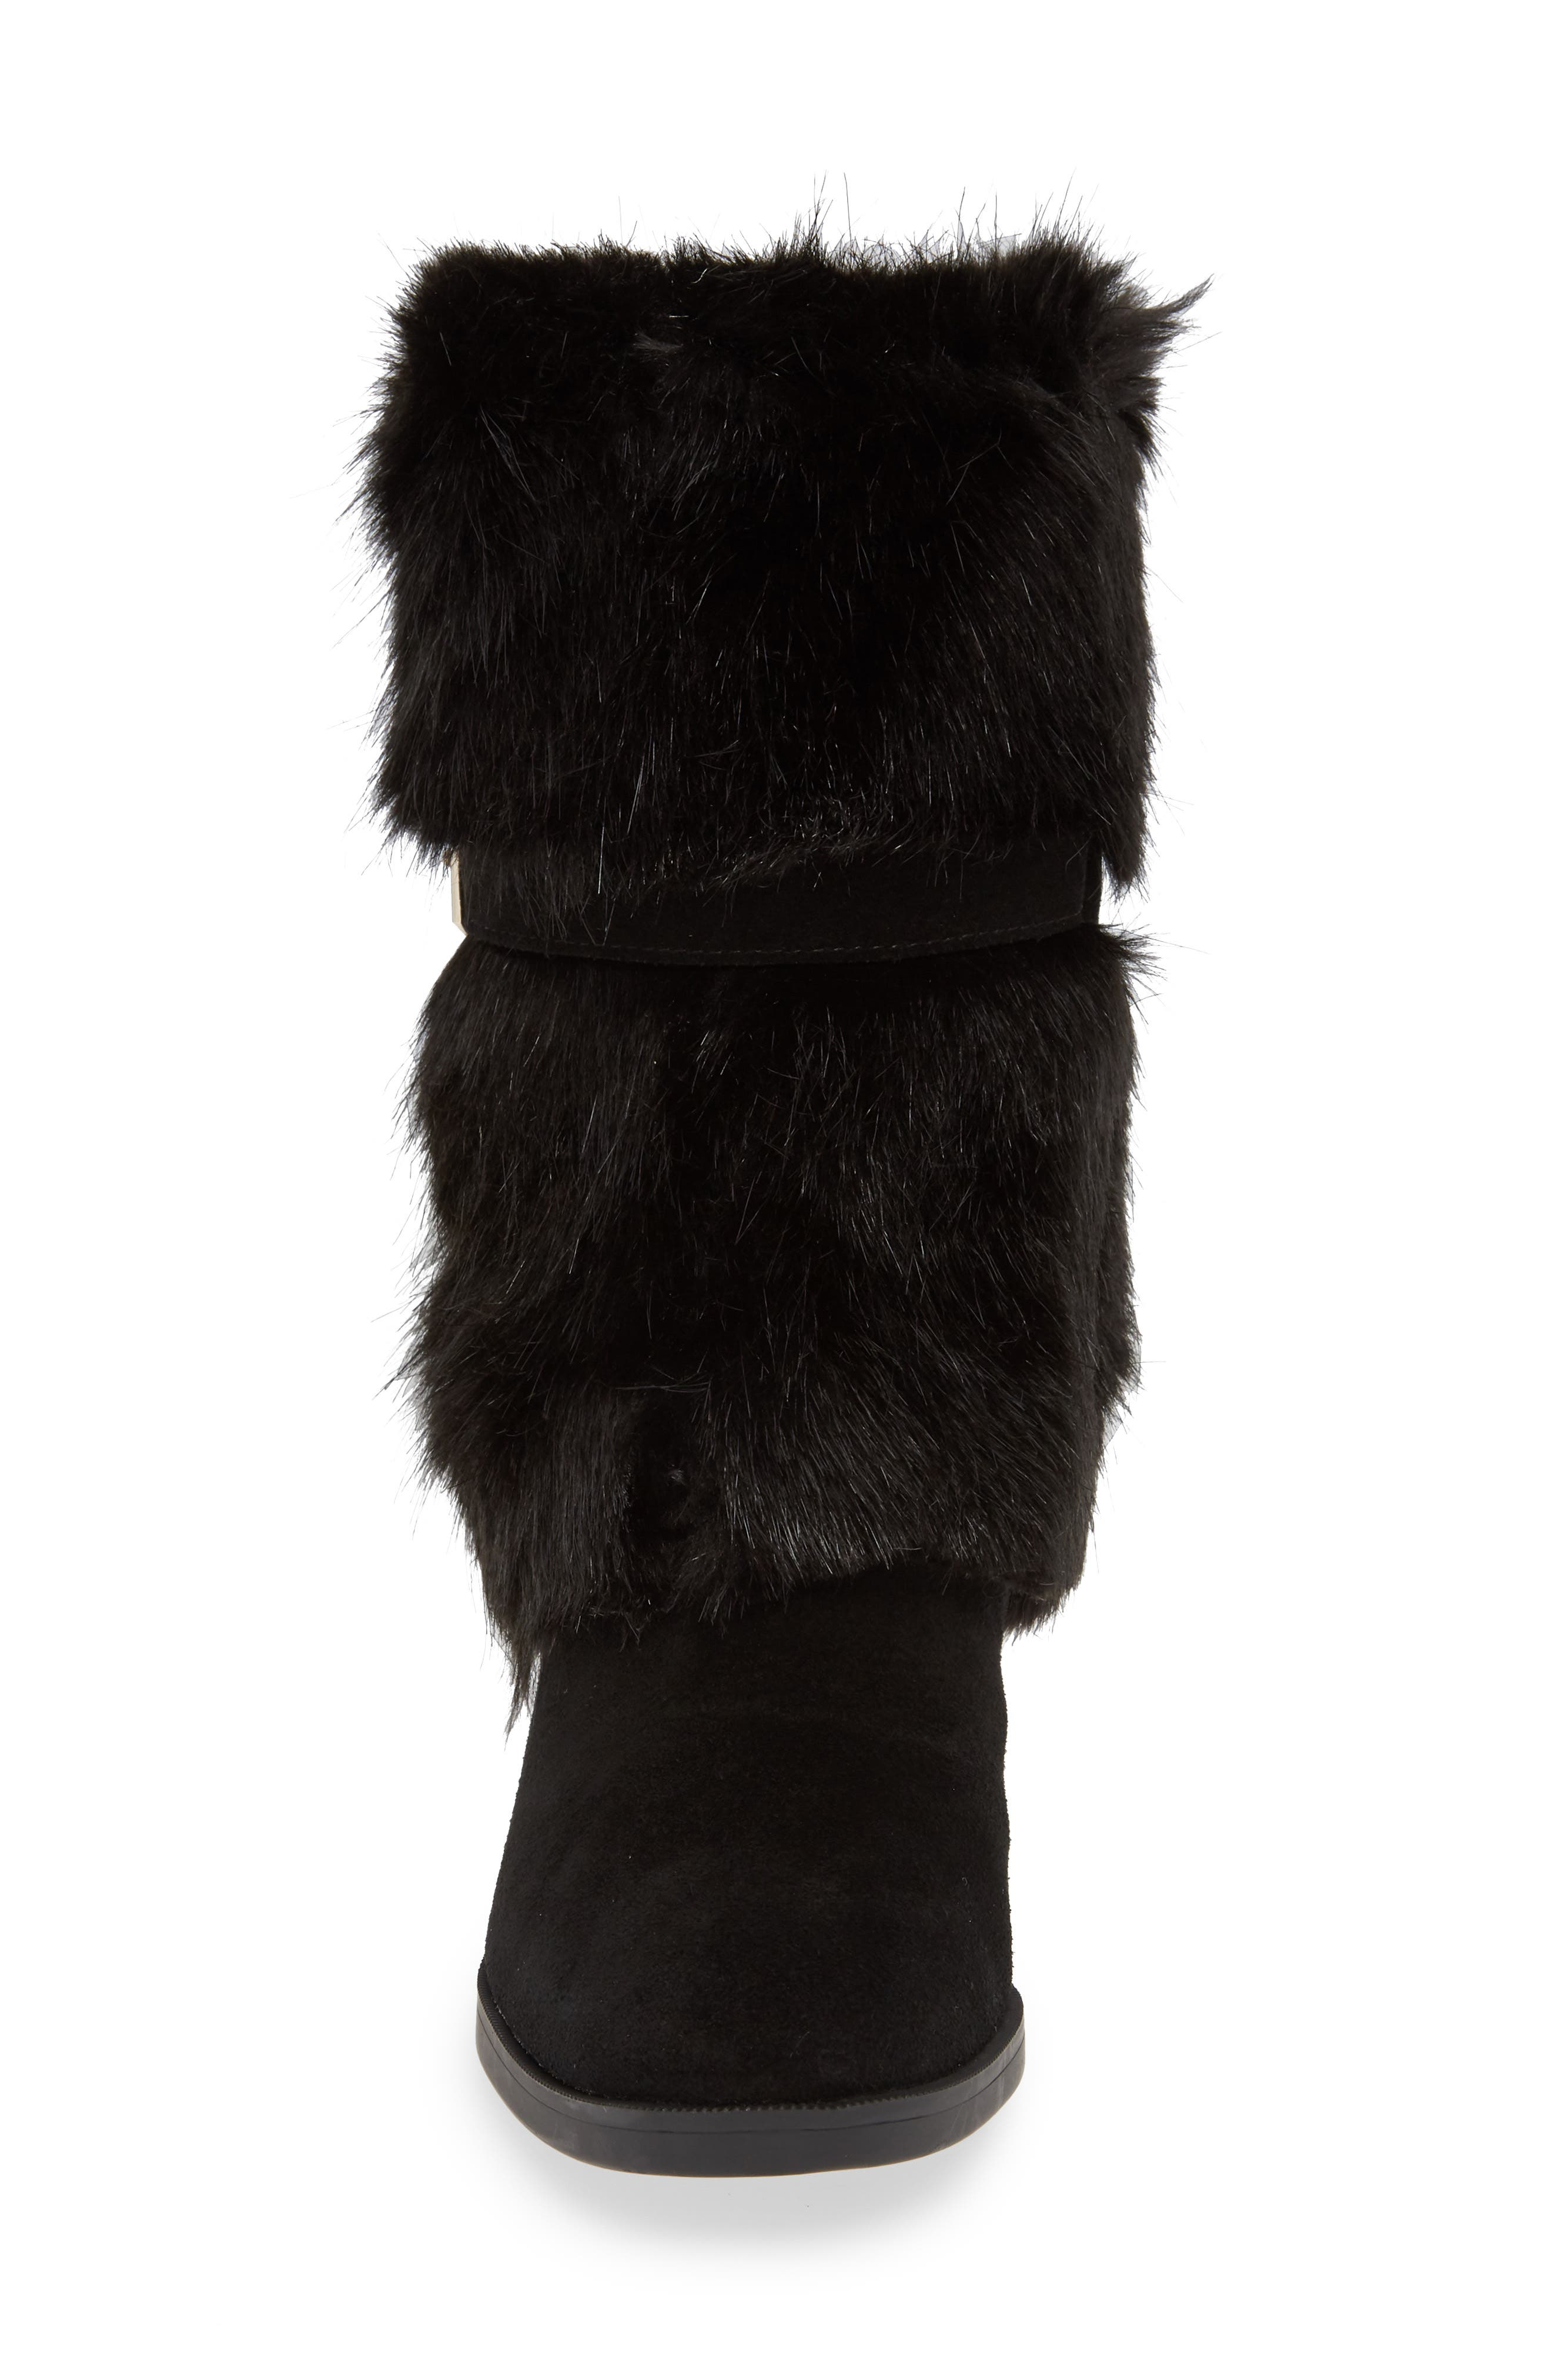 Giselle Water Resistant Faux Fur Boot,                             Alternate thumbnail 4, color,                             BLACK SUEDE